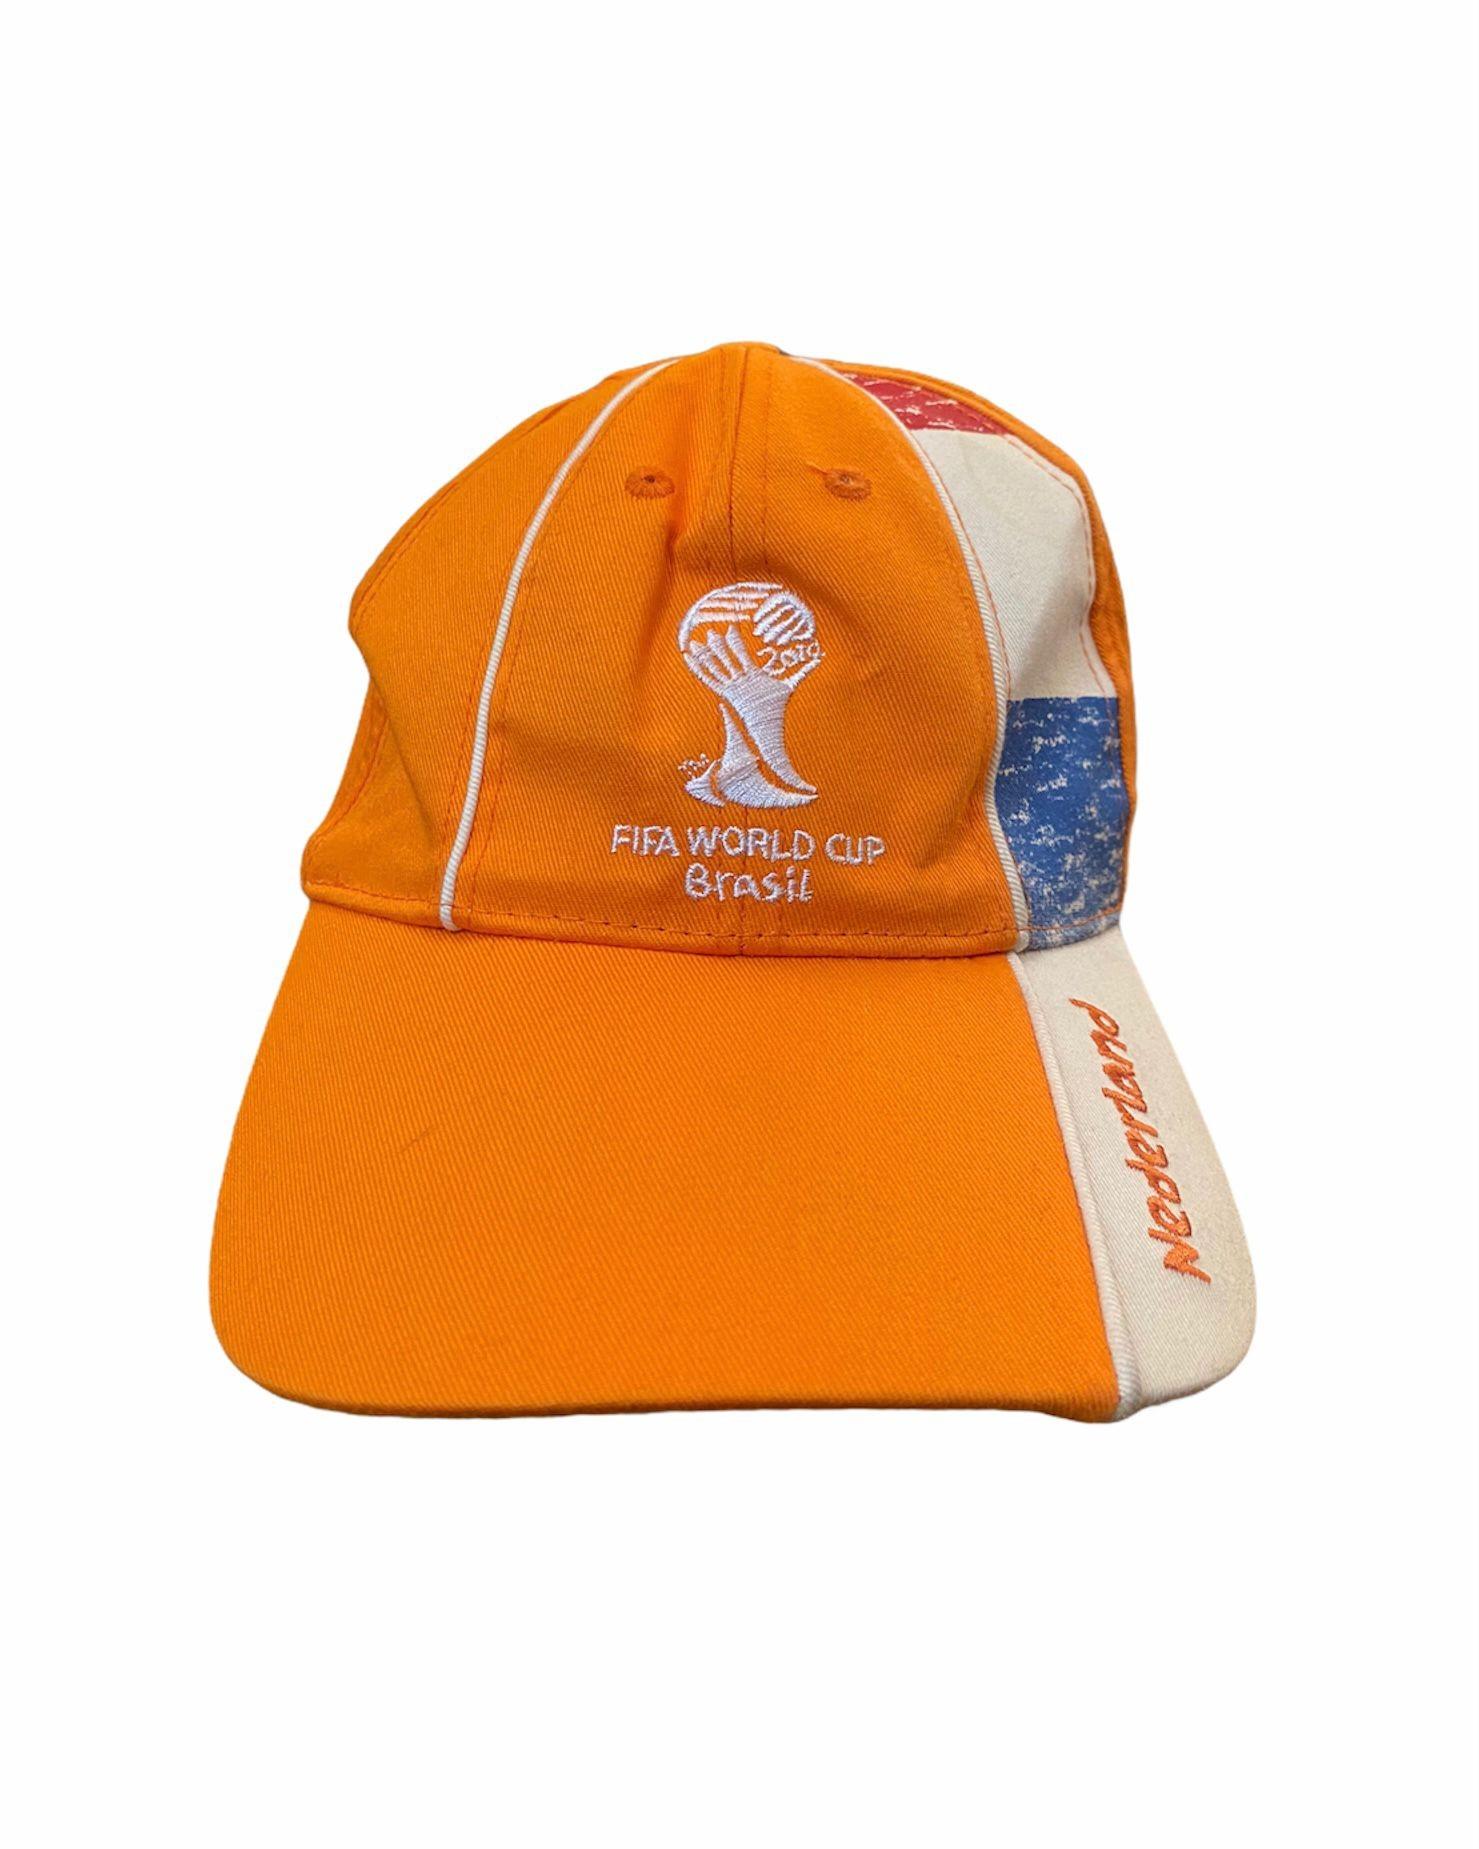 Fifa World Cup 2014 Nederland Şapka